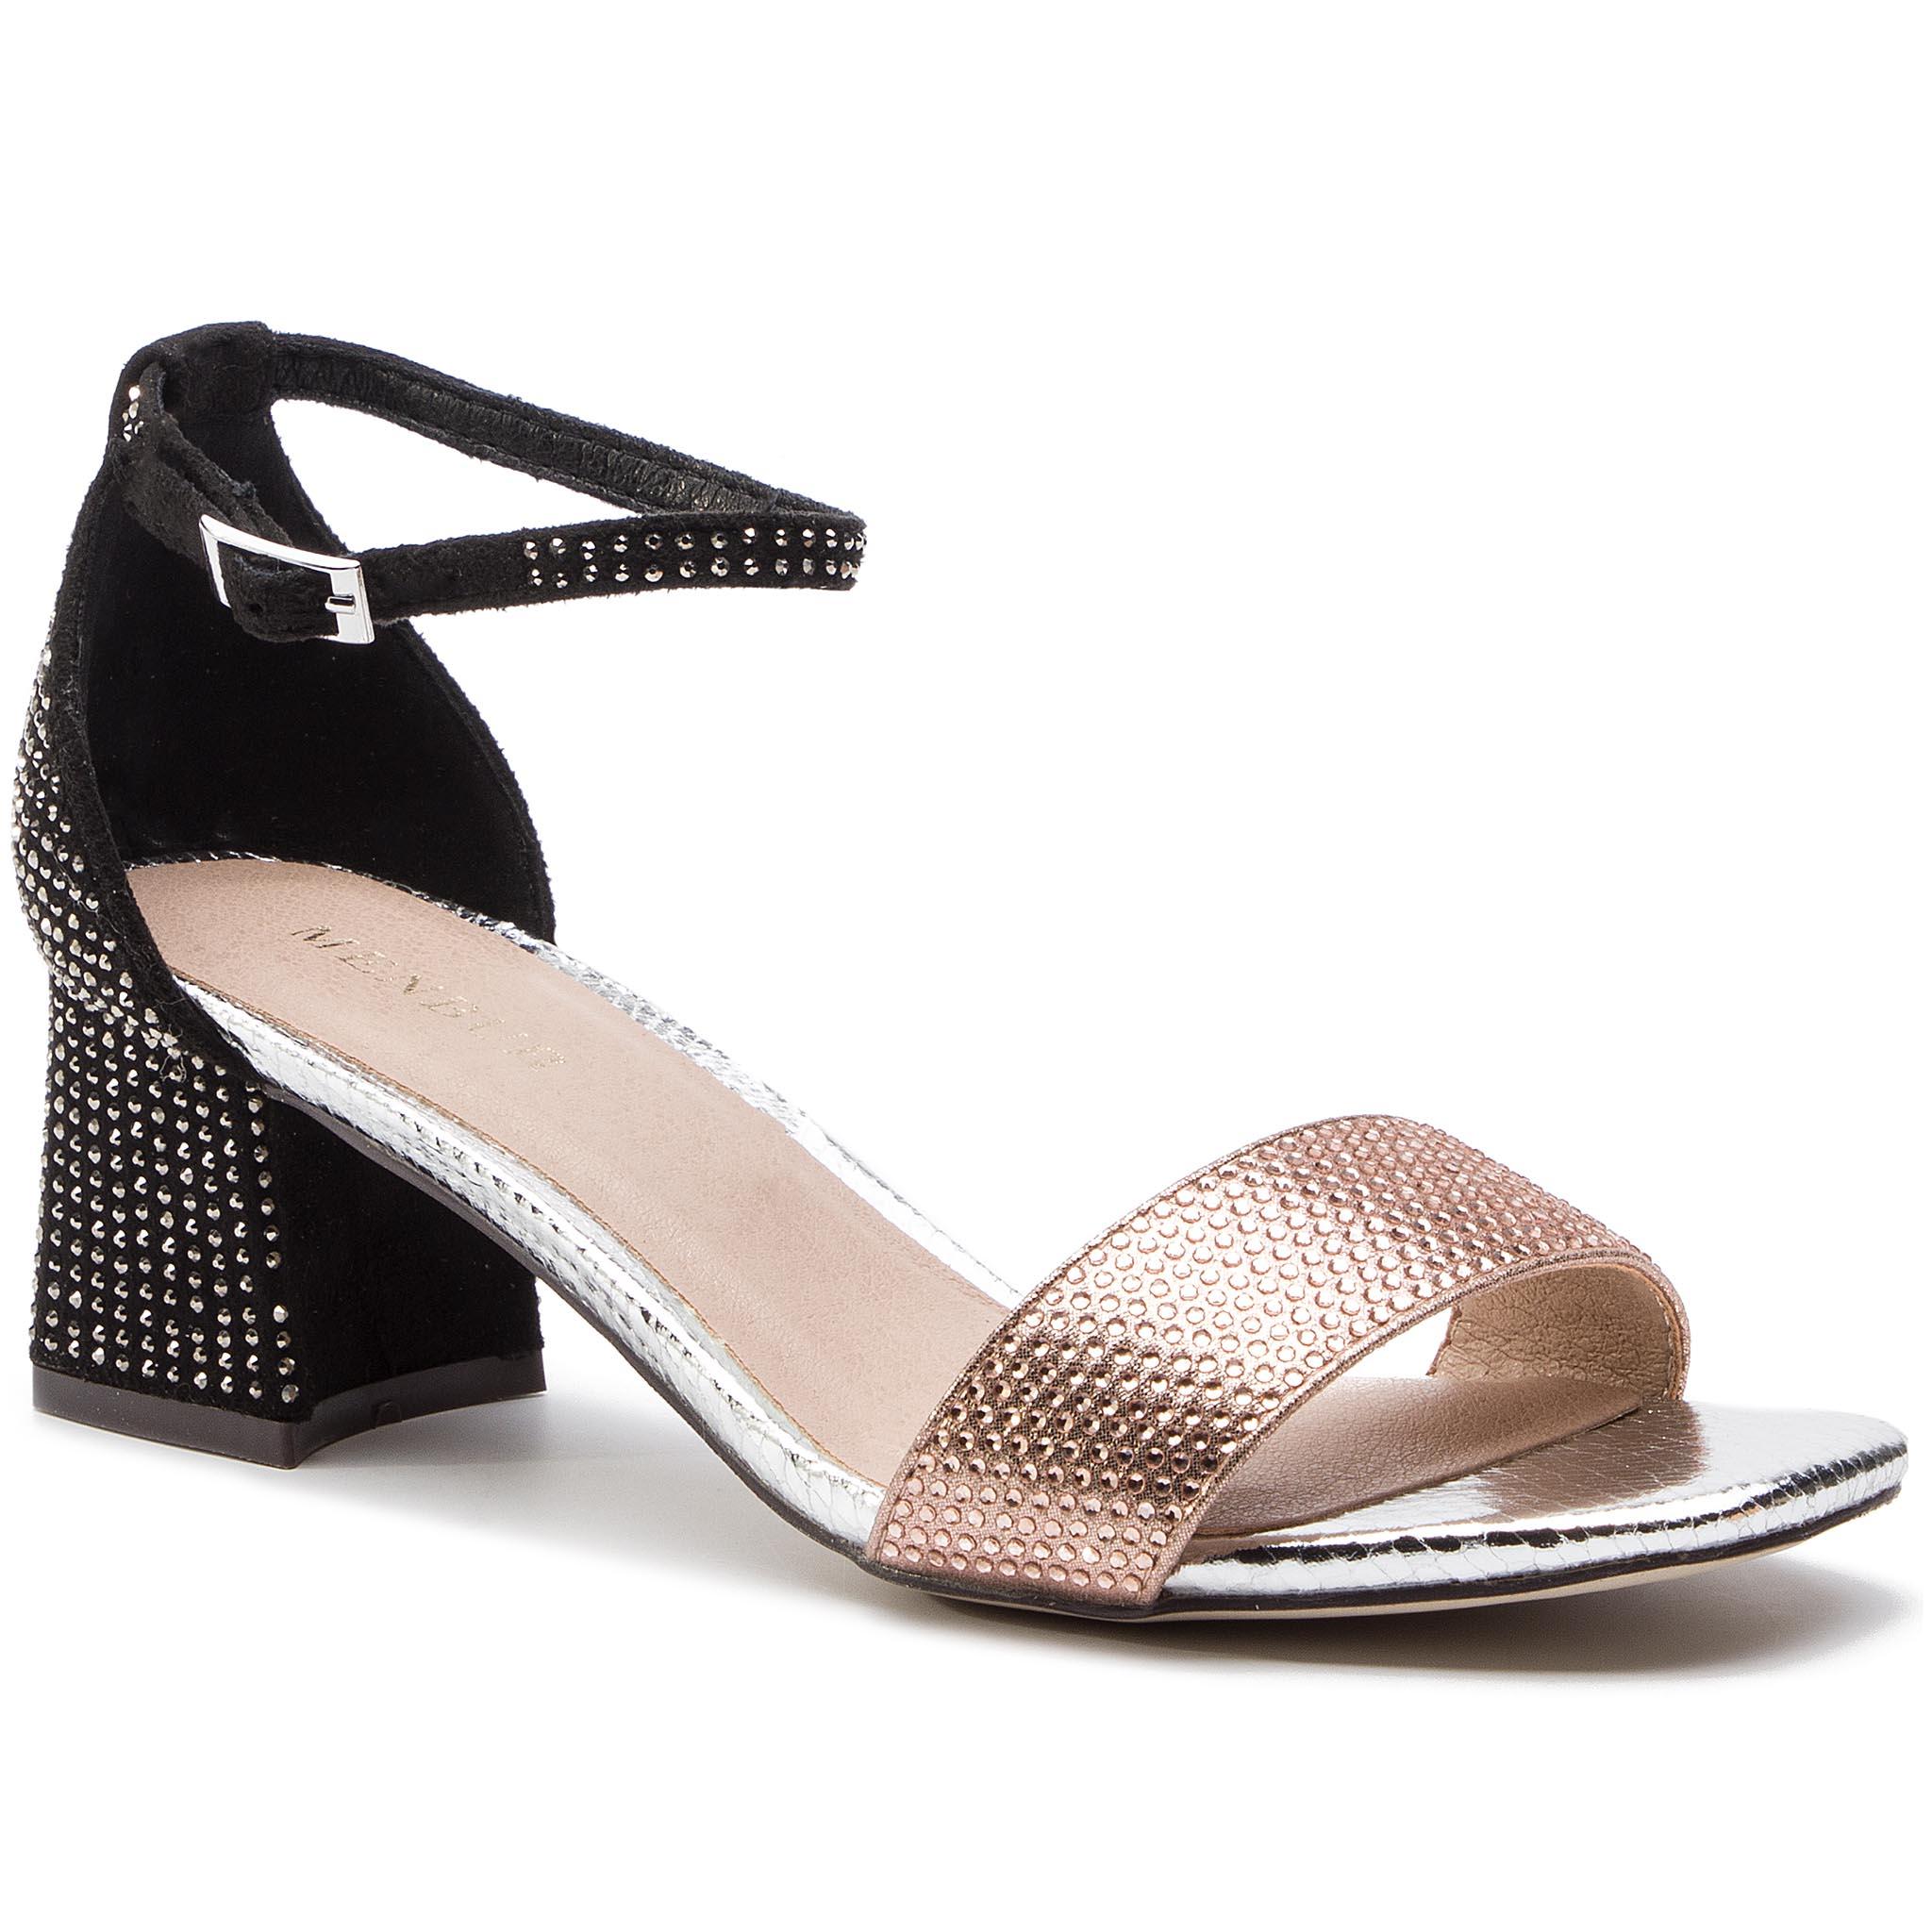 c1f1482ef Sandals MENBUR - 09768 Even Rose 0038 - Elegant sandals - Sandals ...